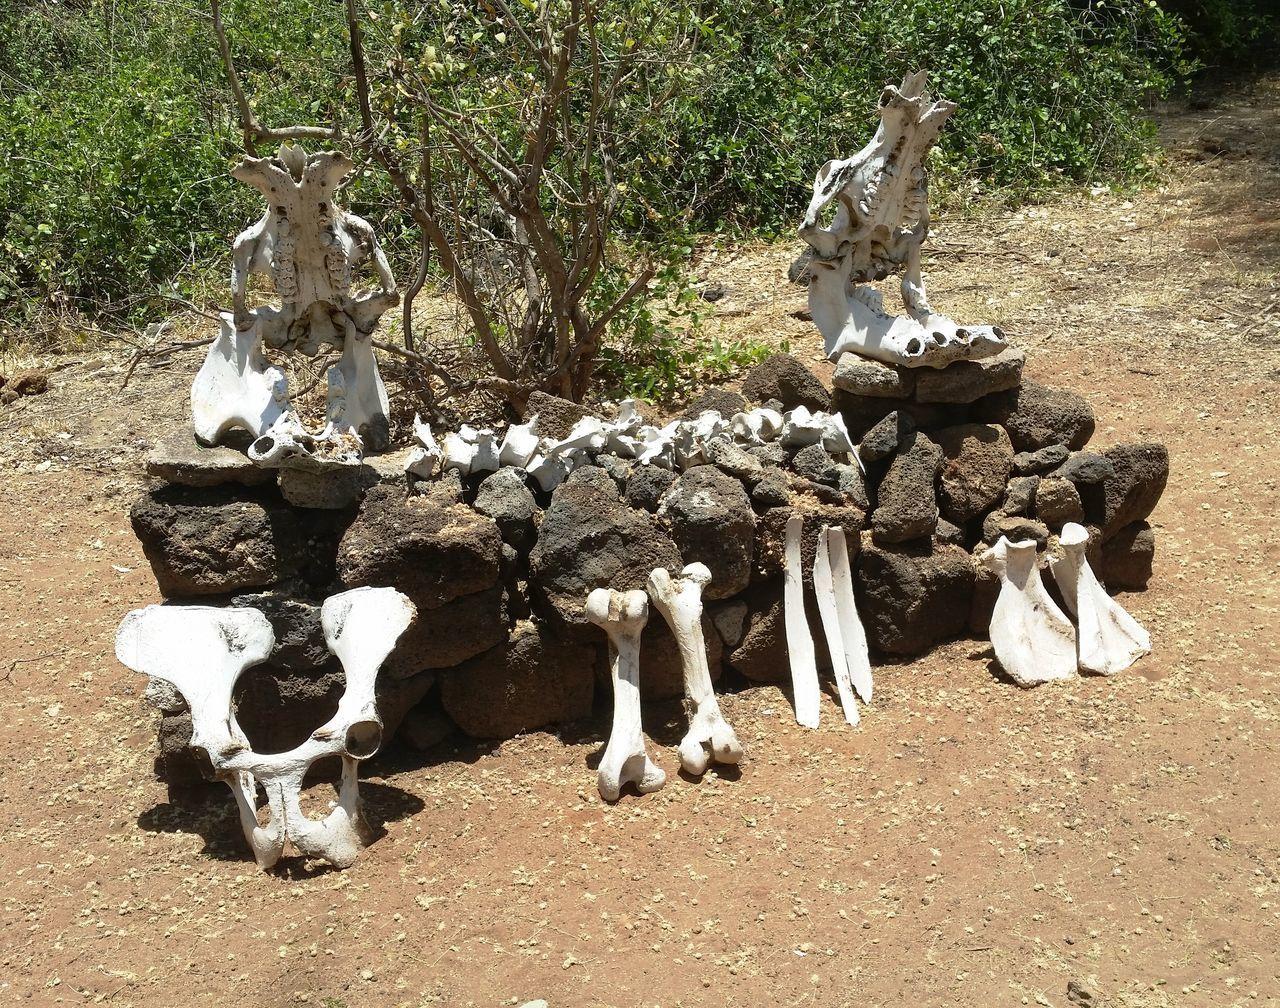 Africa Bones Kenya Nationalpark Nature Safari Skeleton Tsavo